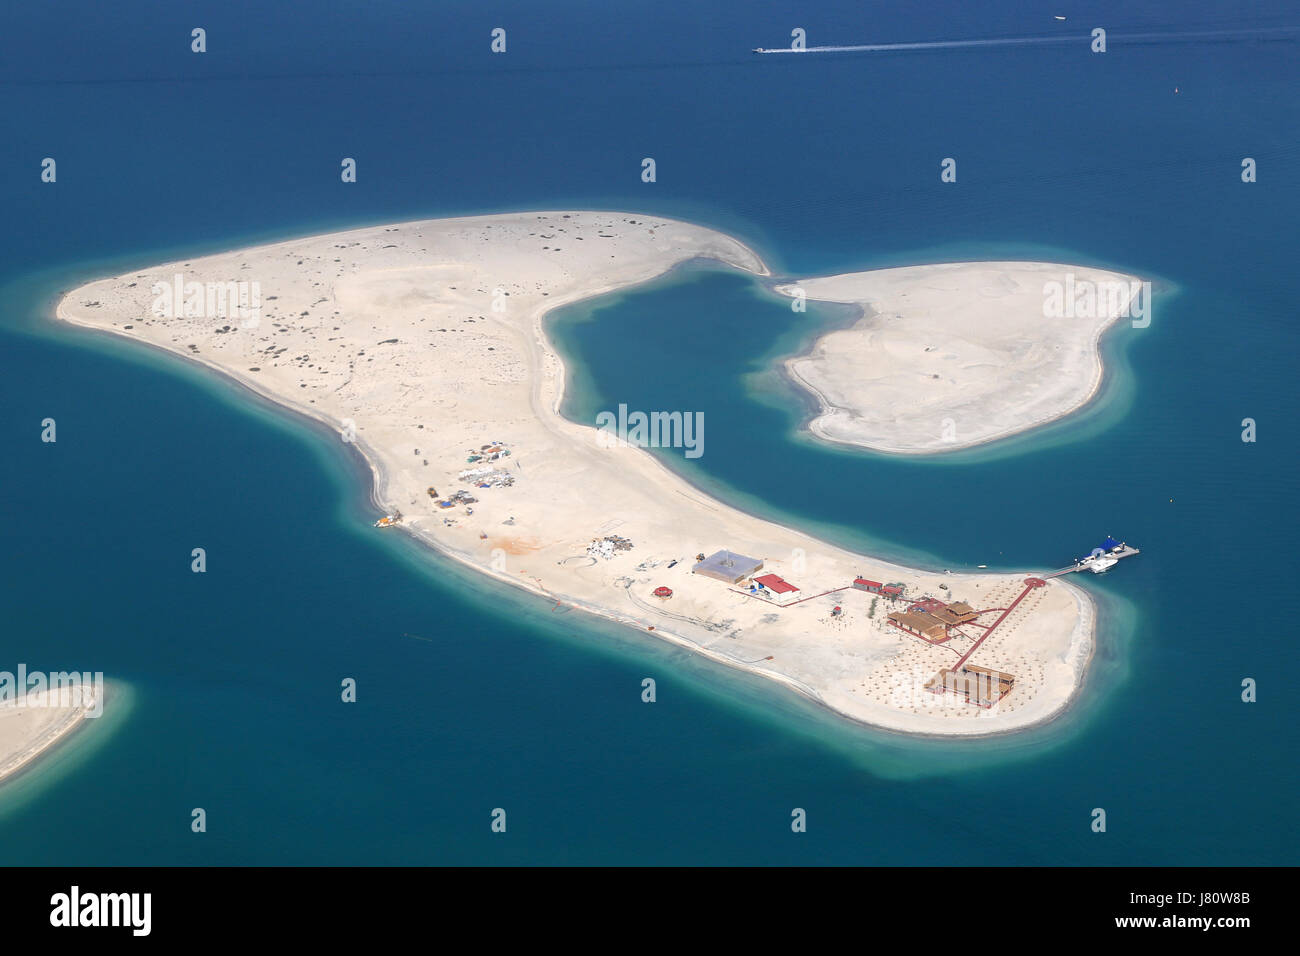 Dubai The World Clarence Island aerial view photography UAE - Stock Image